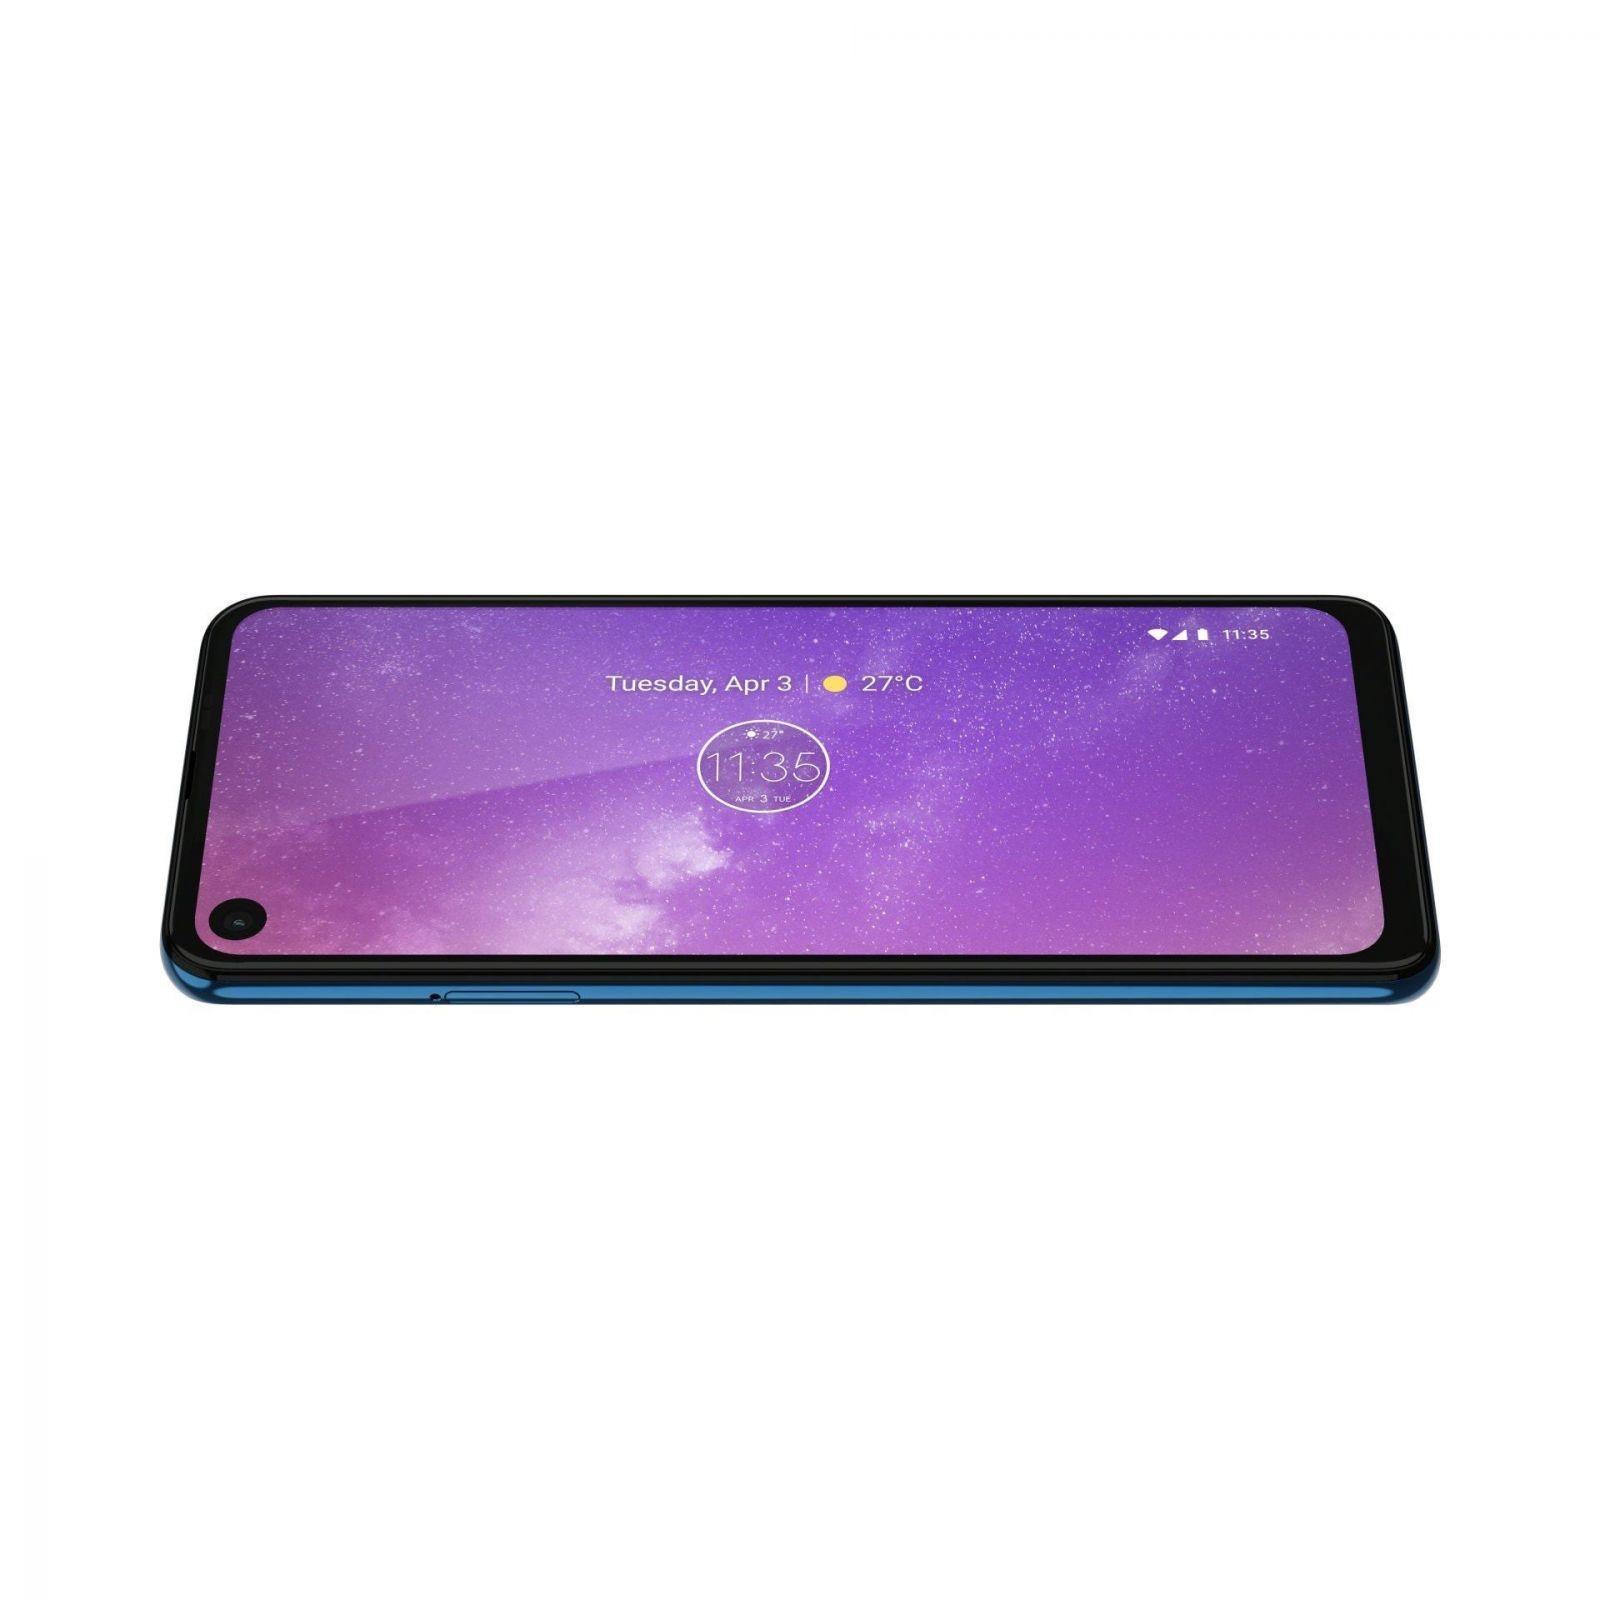 Motorola представила новый смартфон Motorola One Vision (motorola one vision row sapphire gradient max vision 2)